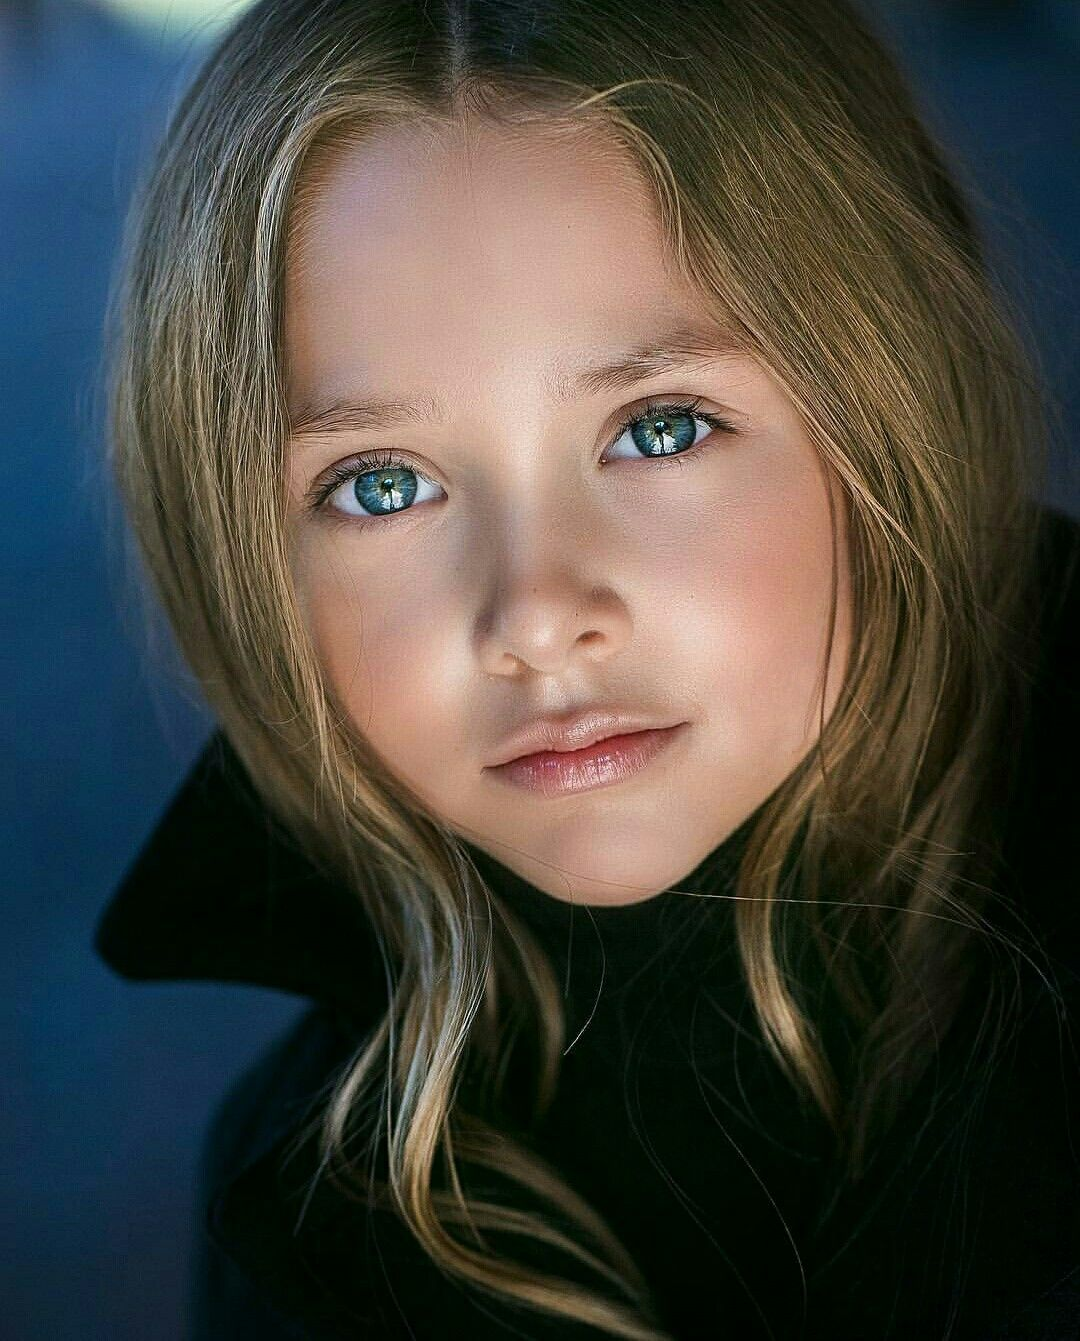 Artbreeder | Digital art girl, Digital portrait art